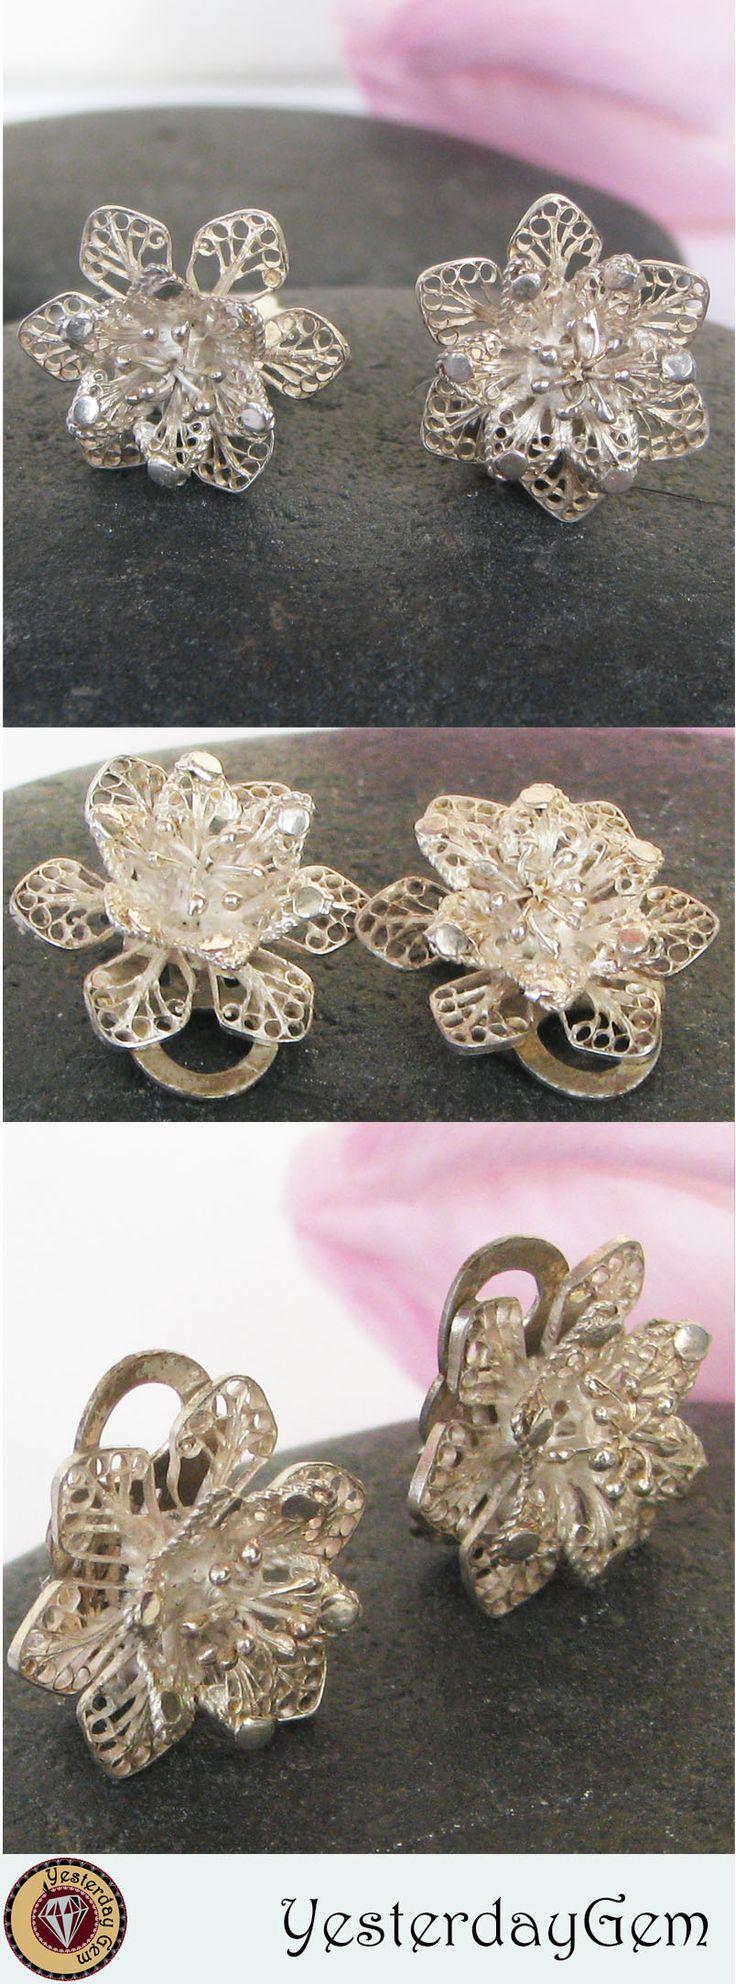 Vintage Silver Filigree Flower Clip on Earrings #filigreejewelry #vintageearrings